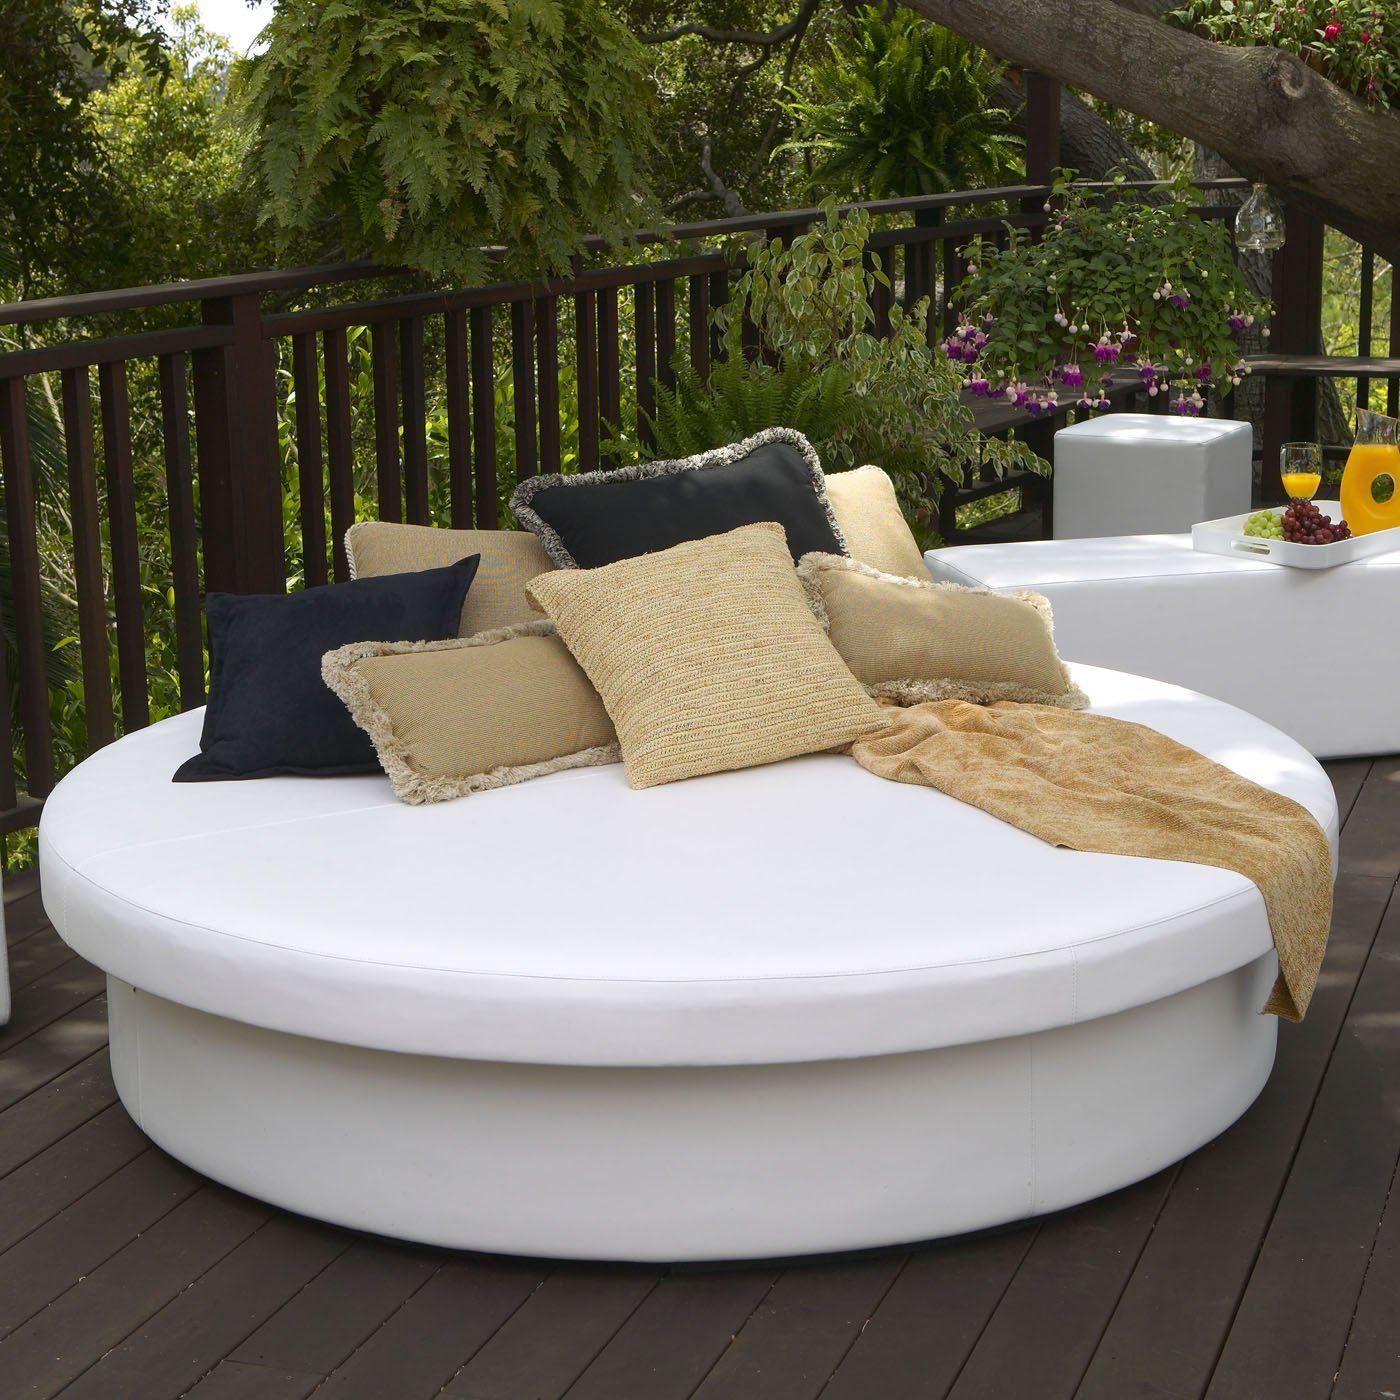 La-Fete Designs SUN PAD Outdoor Sun Round Resort Daybed - ATG ...